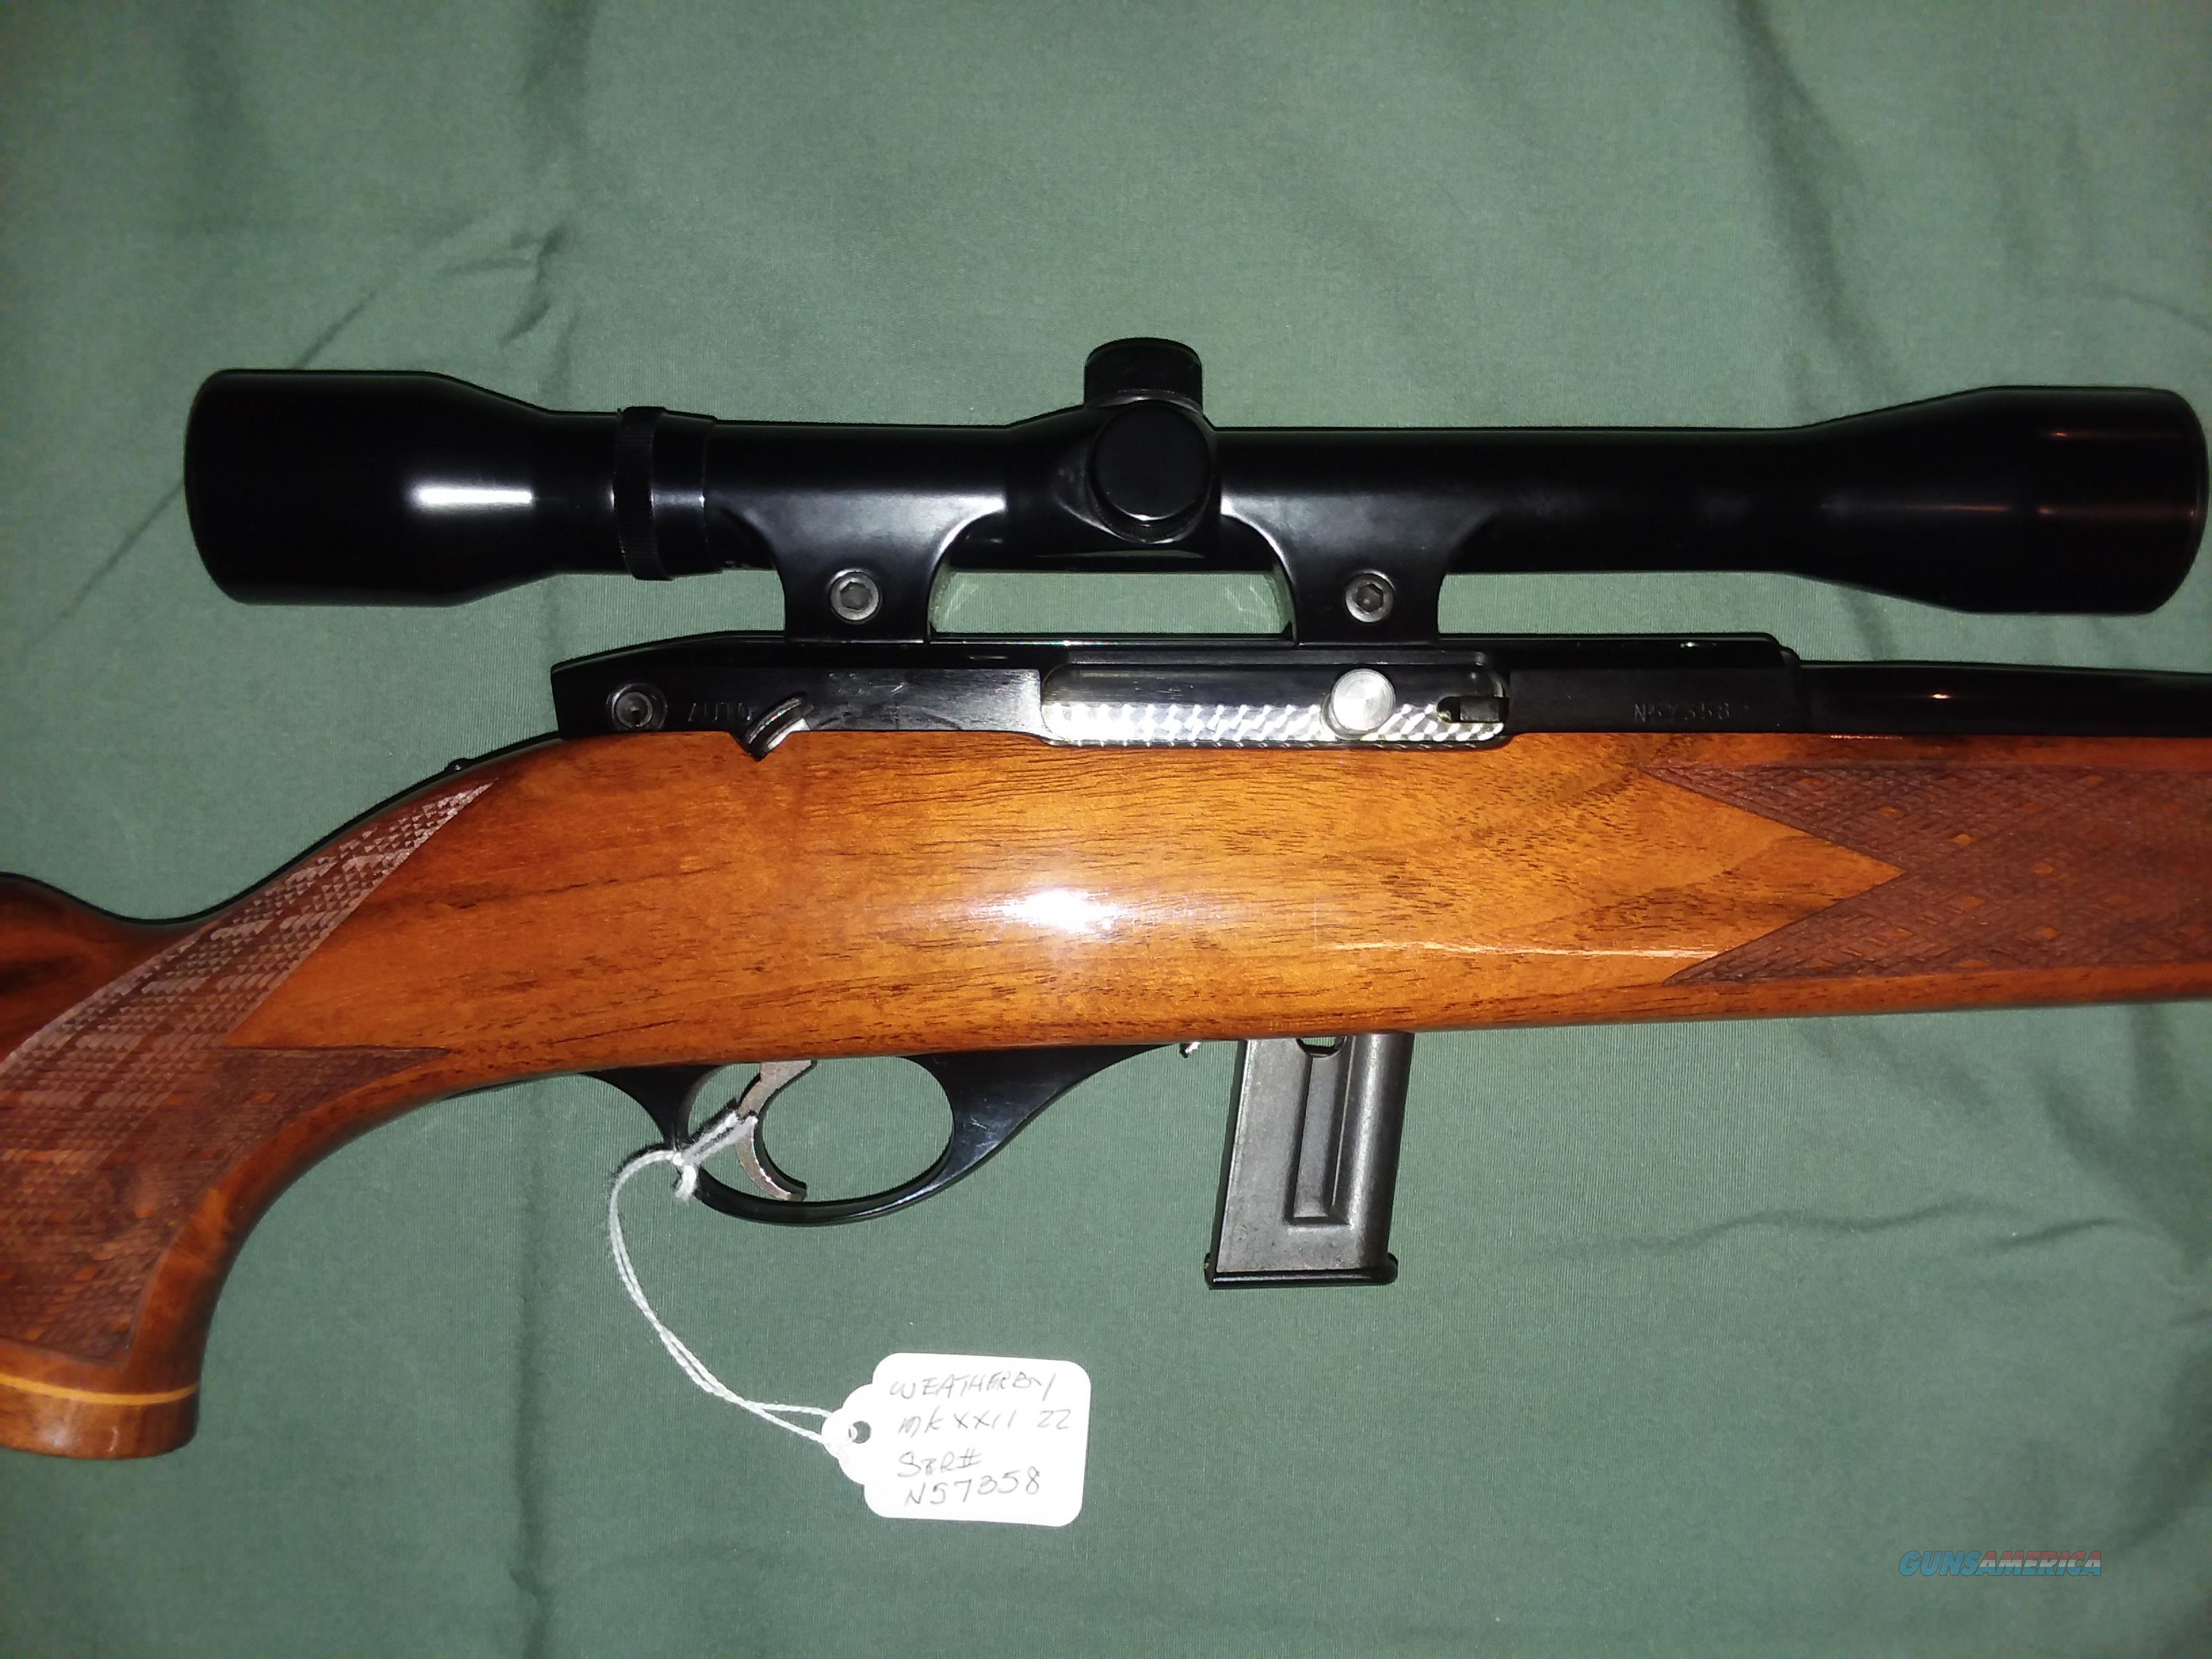 Weatherby Mark XXII 22LR Clip w scope, Mint as new!  Guns > Rifles > Weatherby Rifles > Sporting